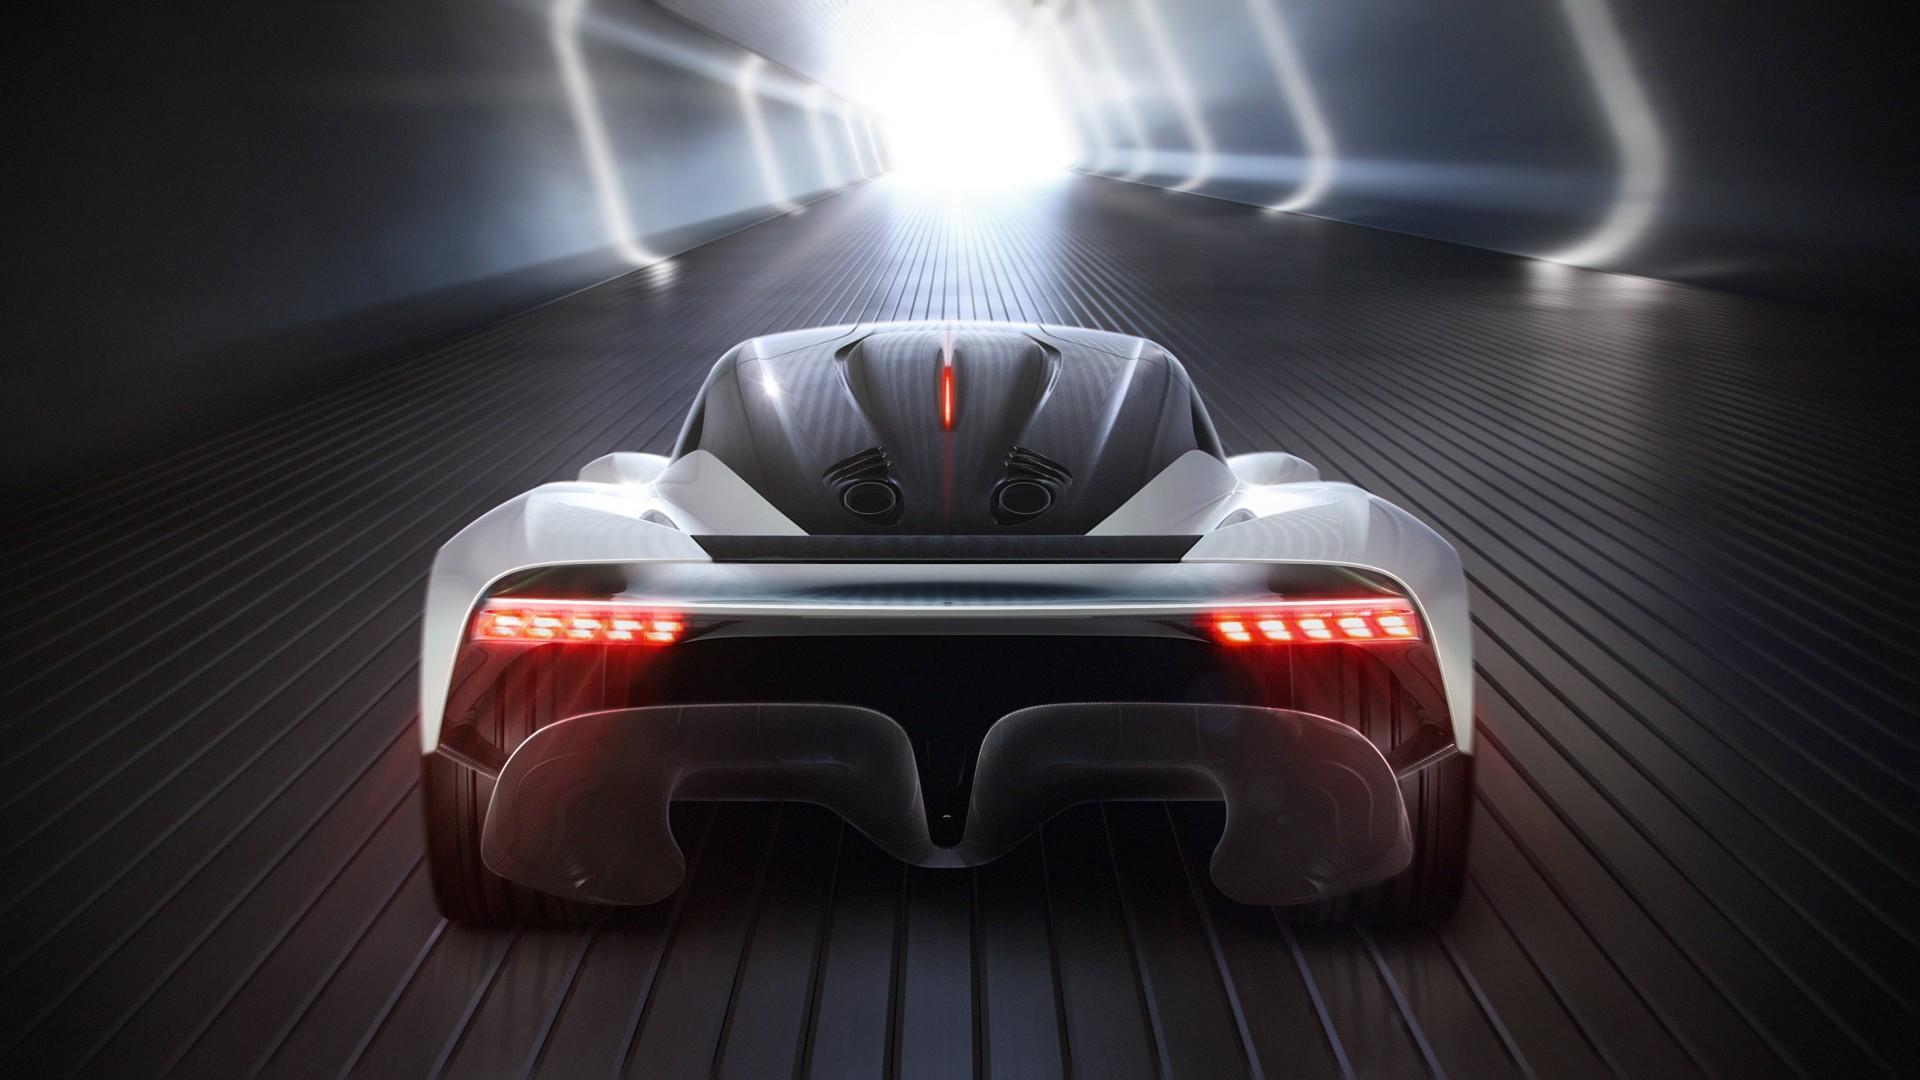 Aston Martin Project 003 2019 4K 3 Wallpaper | HD Car ...